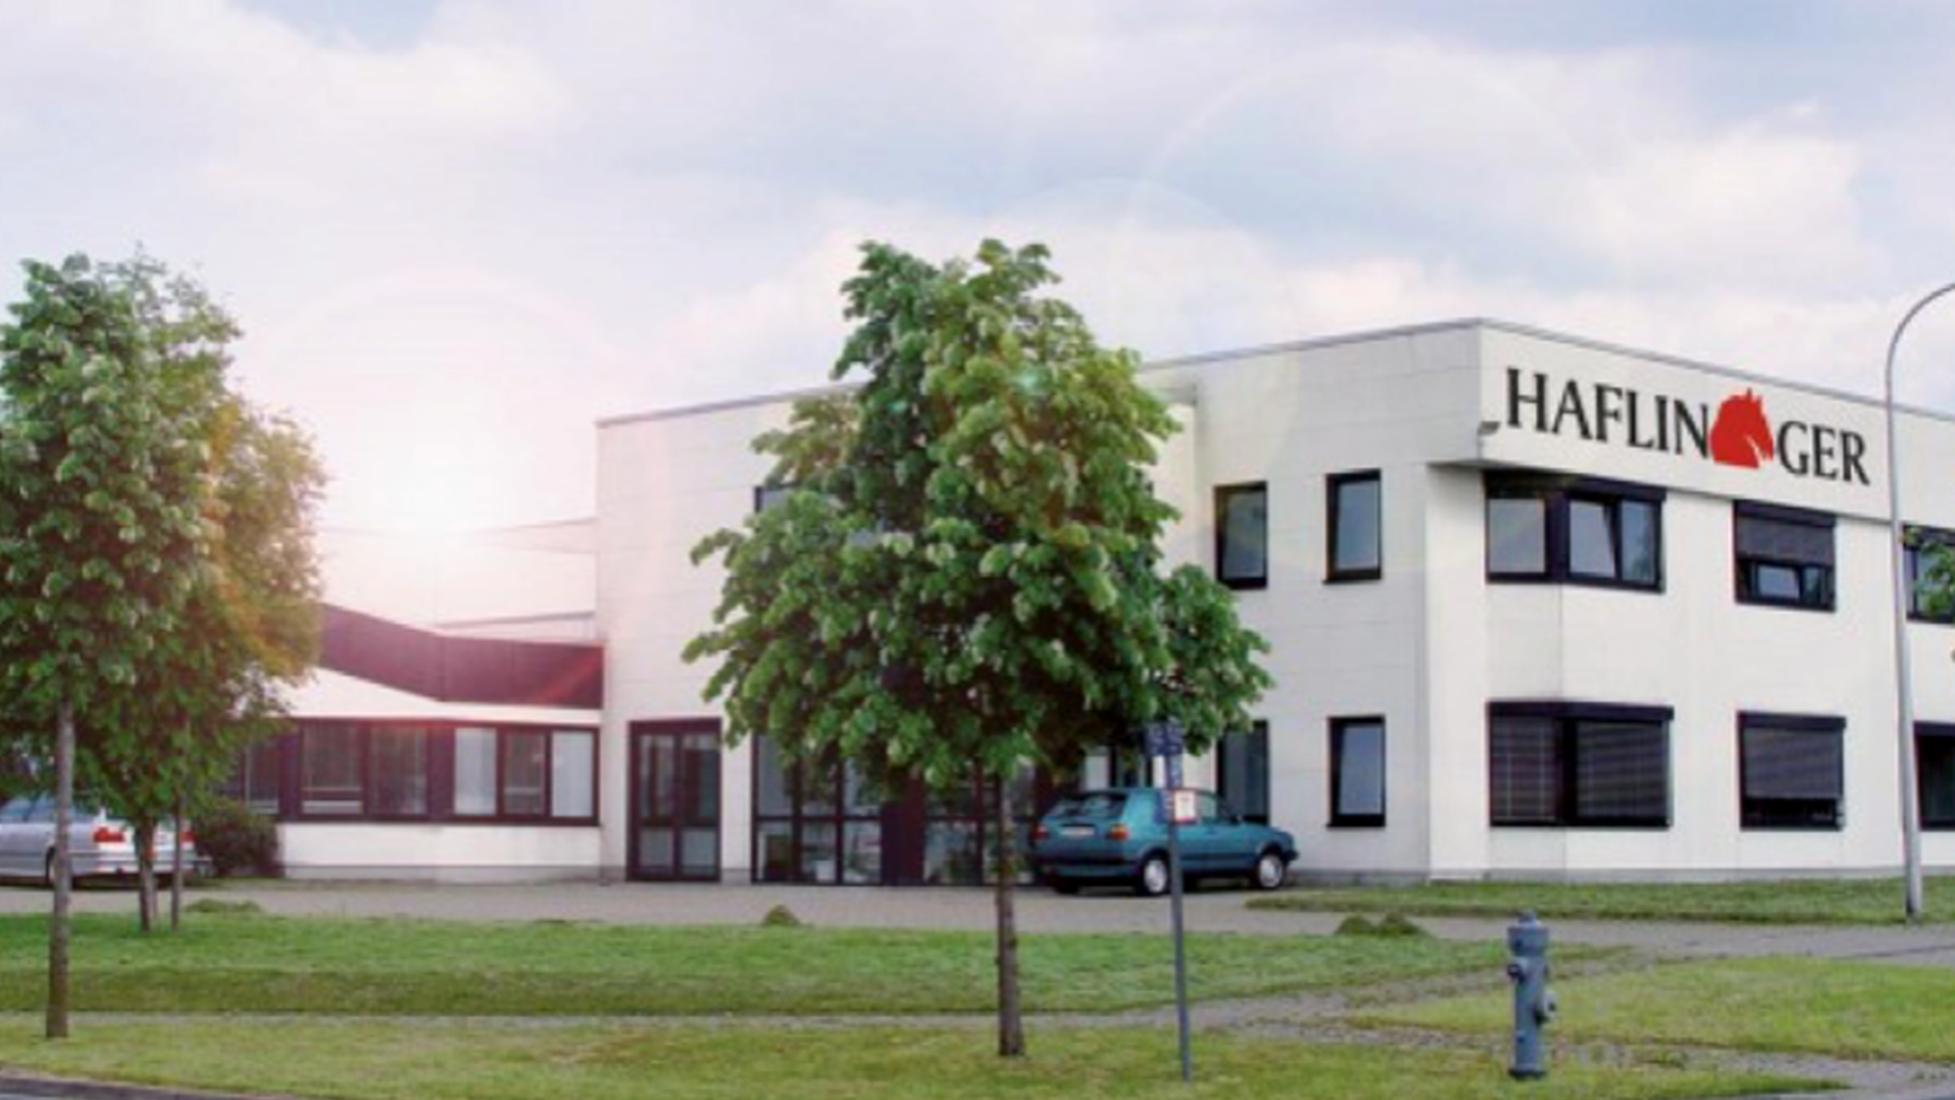 haflinger e1494673849274 - Haflinger - iesse Schuh GmbH